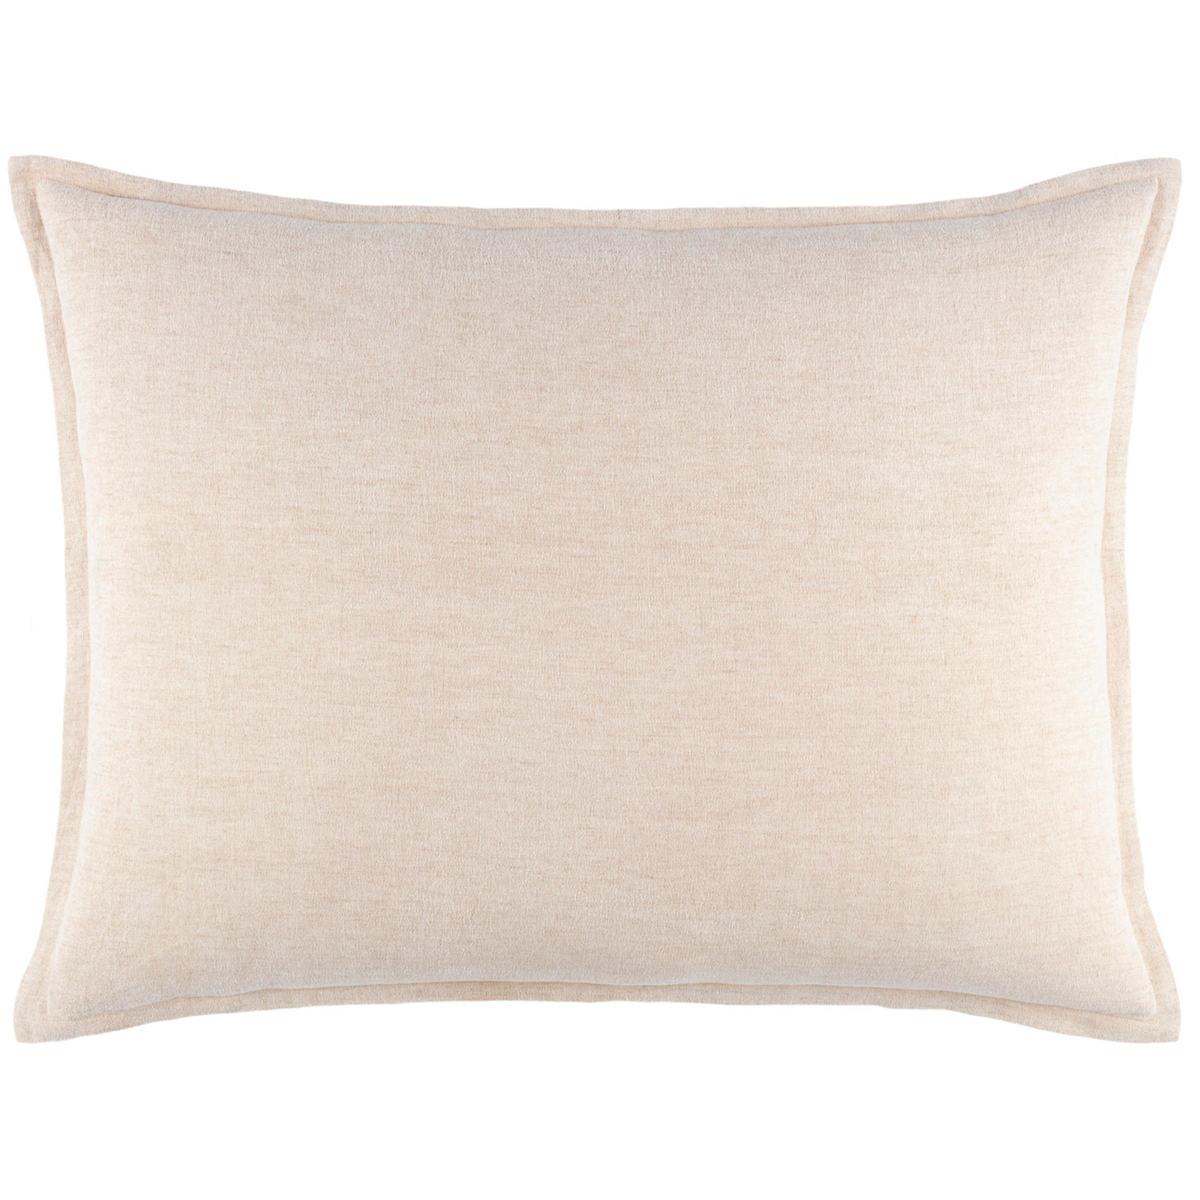 Linen Chenille Natural Decorative Pillow